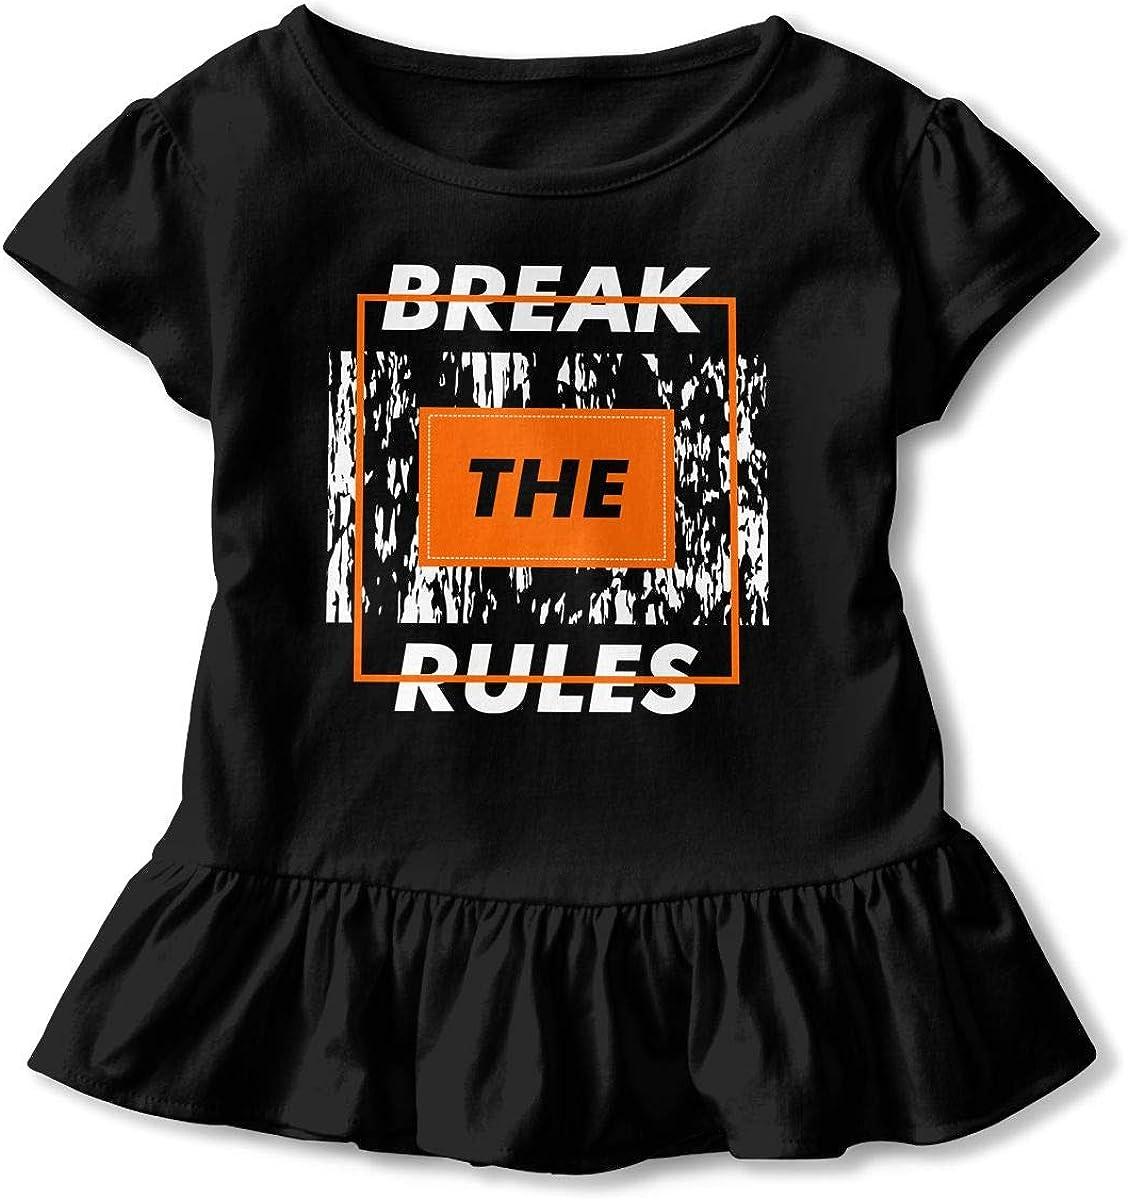 Break The Rules Toddler Girls T Shirt Kids Cotton Short Sleeve Ruffle Tee